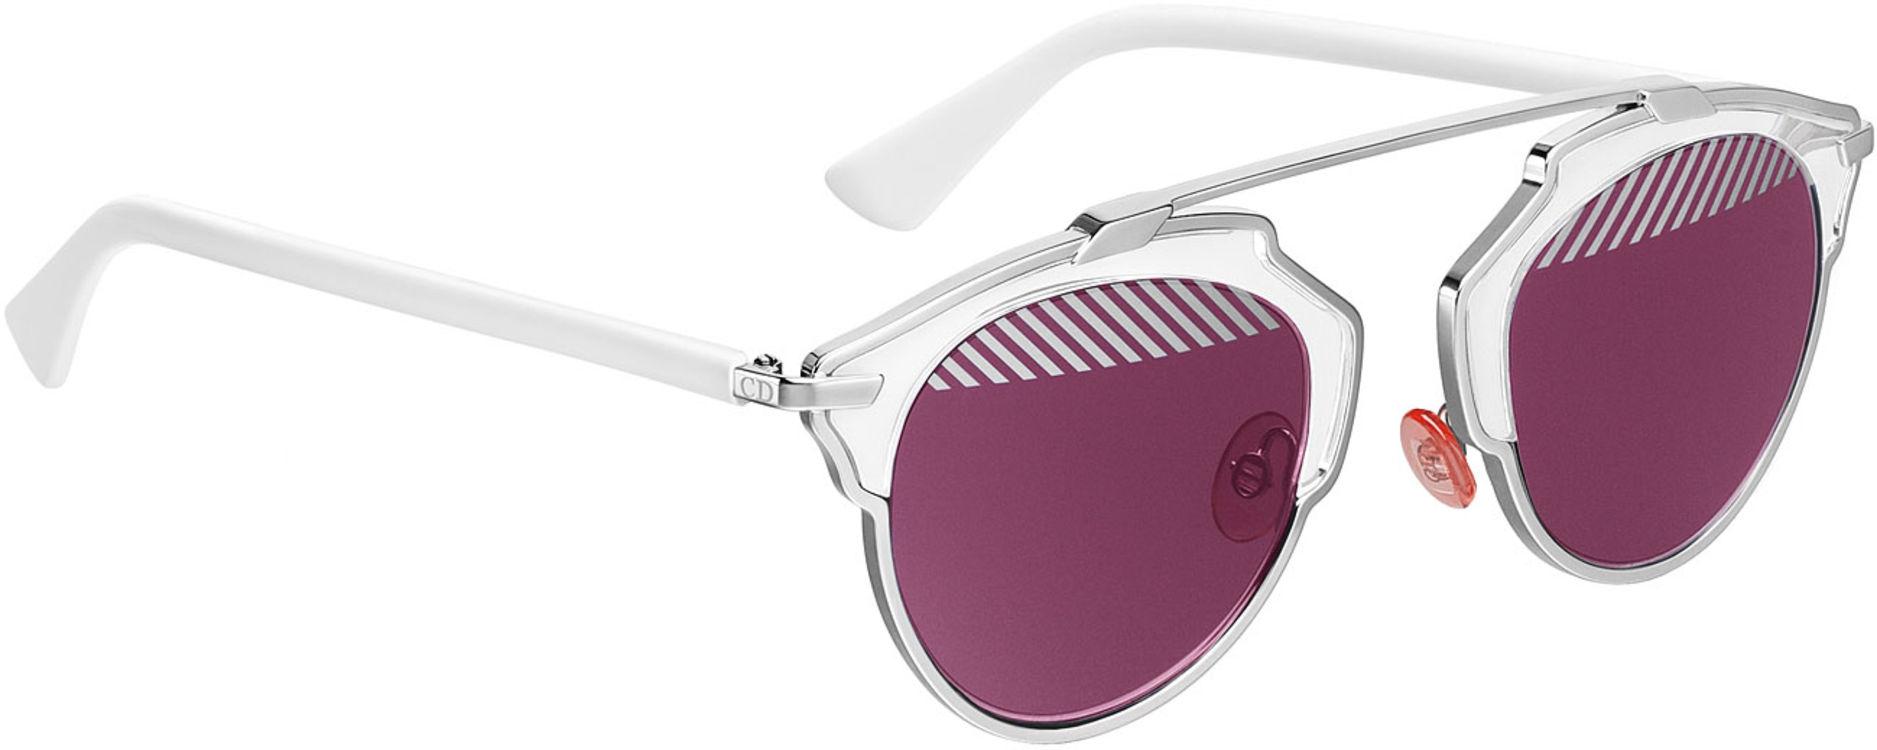 Dior Eyewear (Bild 2)